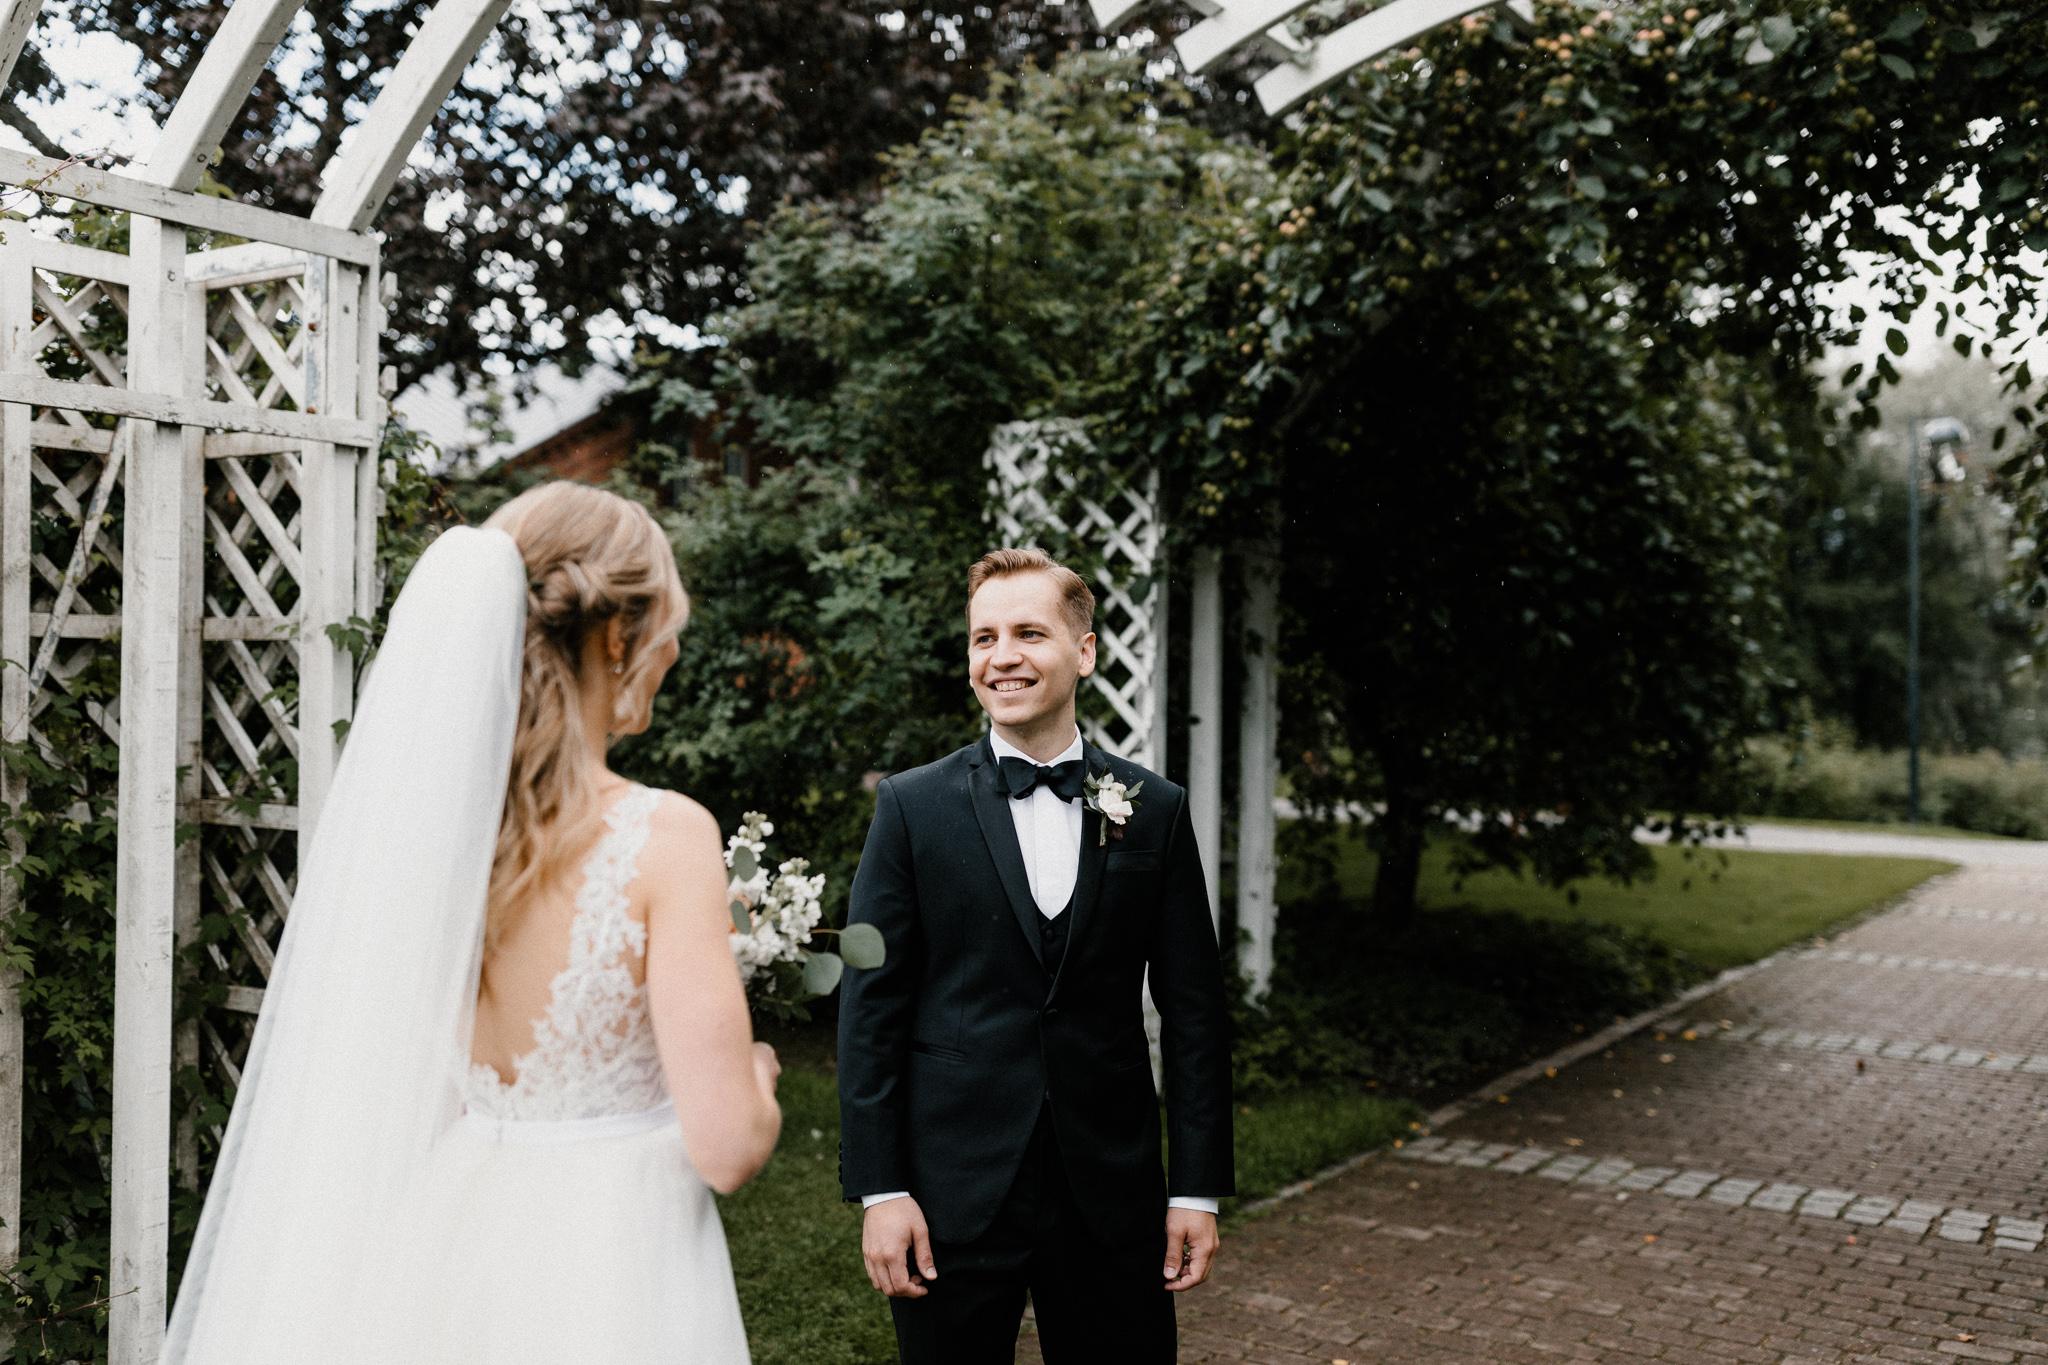 Johanna + Mikko - Tampere - Photo by Patrick Karkkolainen Wedding Photographer-19.jpg